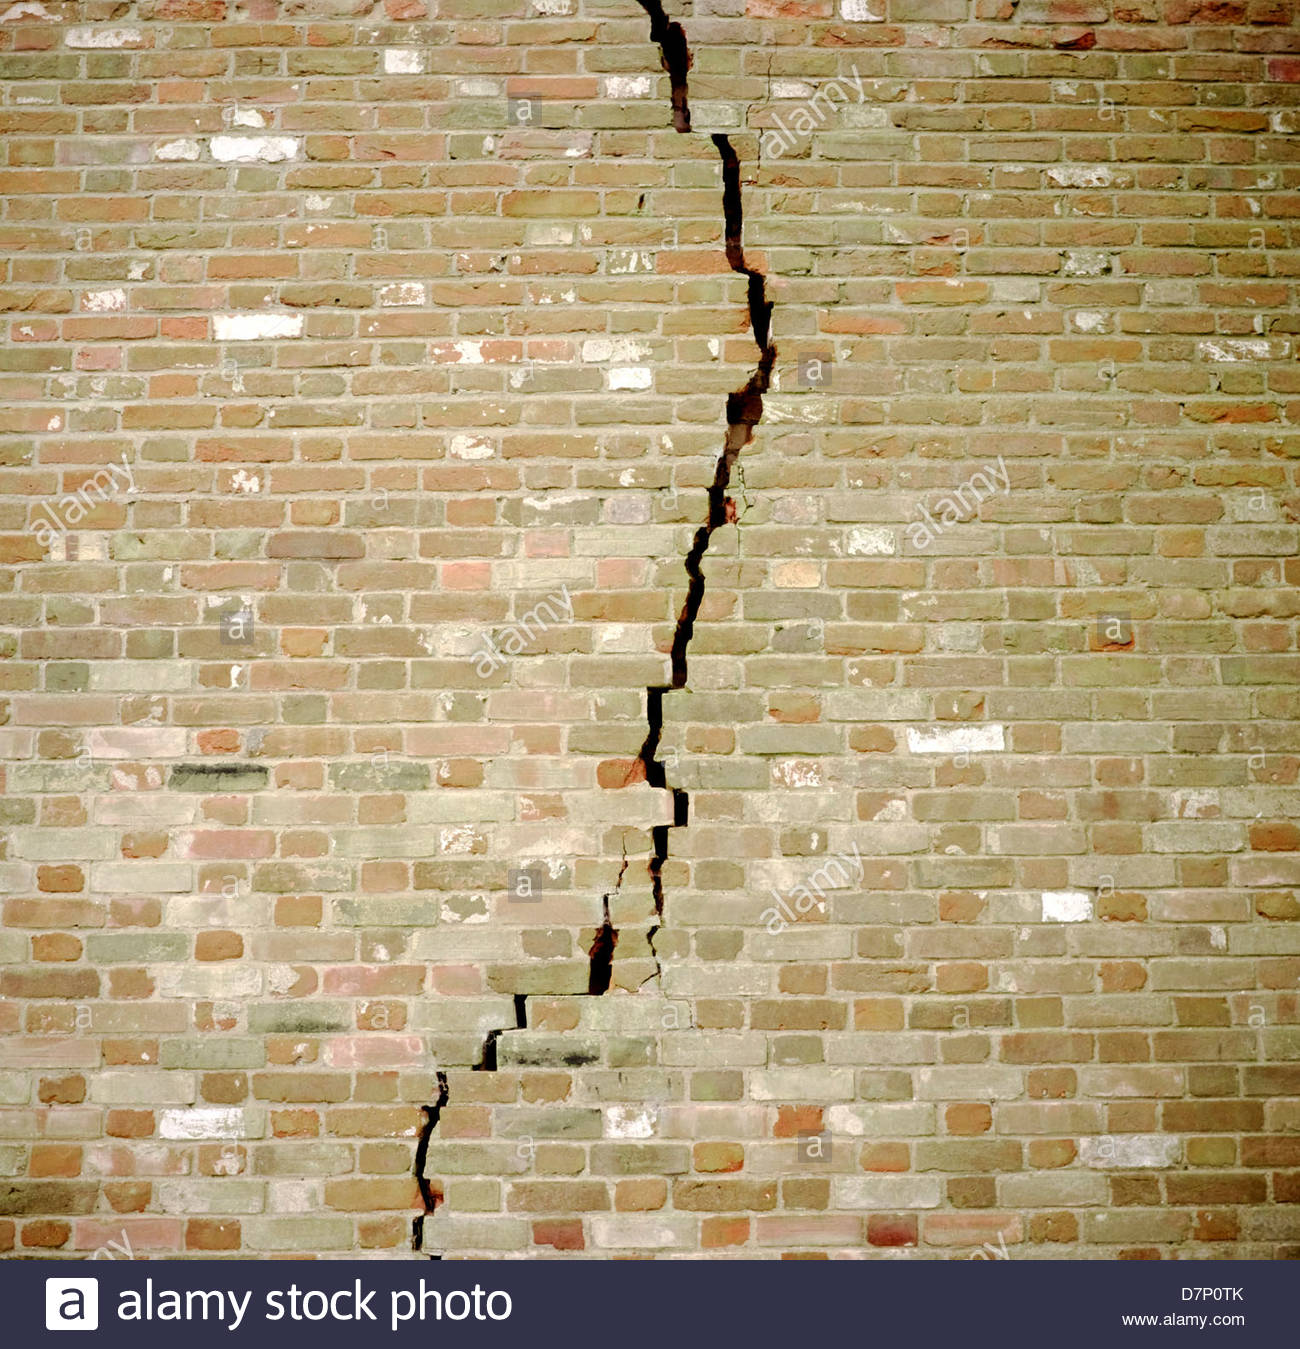 Earthquake Crack Stock Photos Amp Earthquake Crack Stock